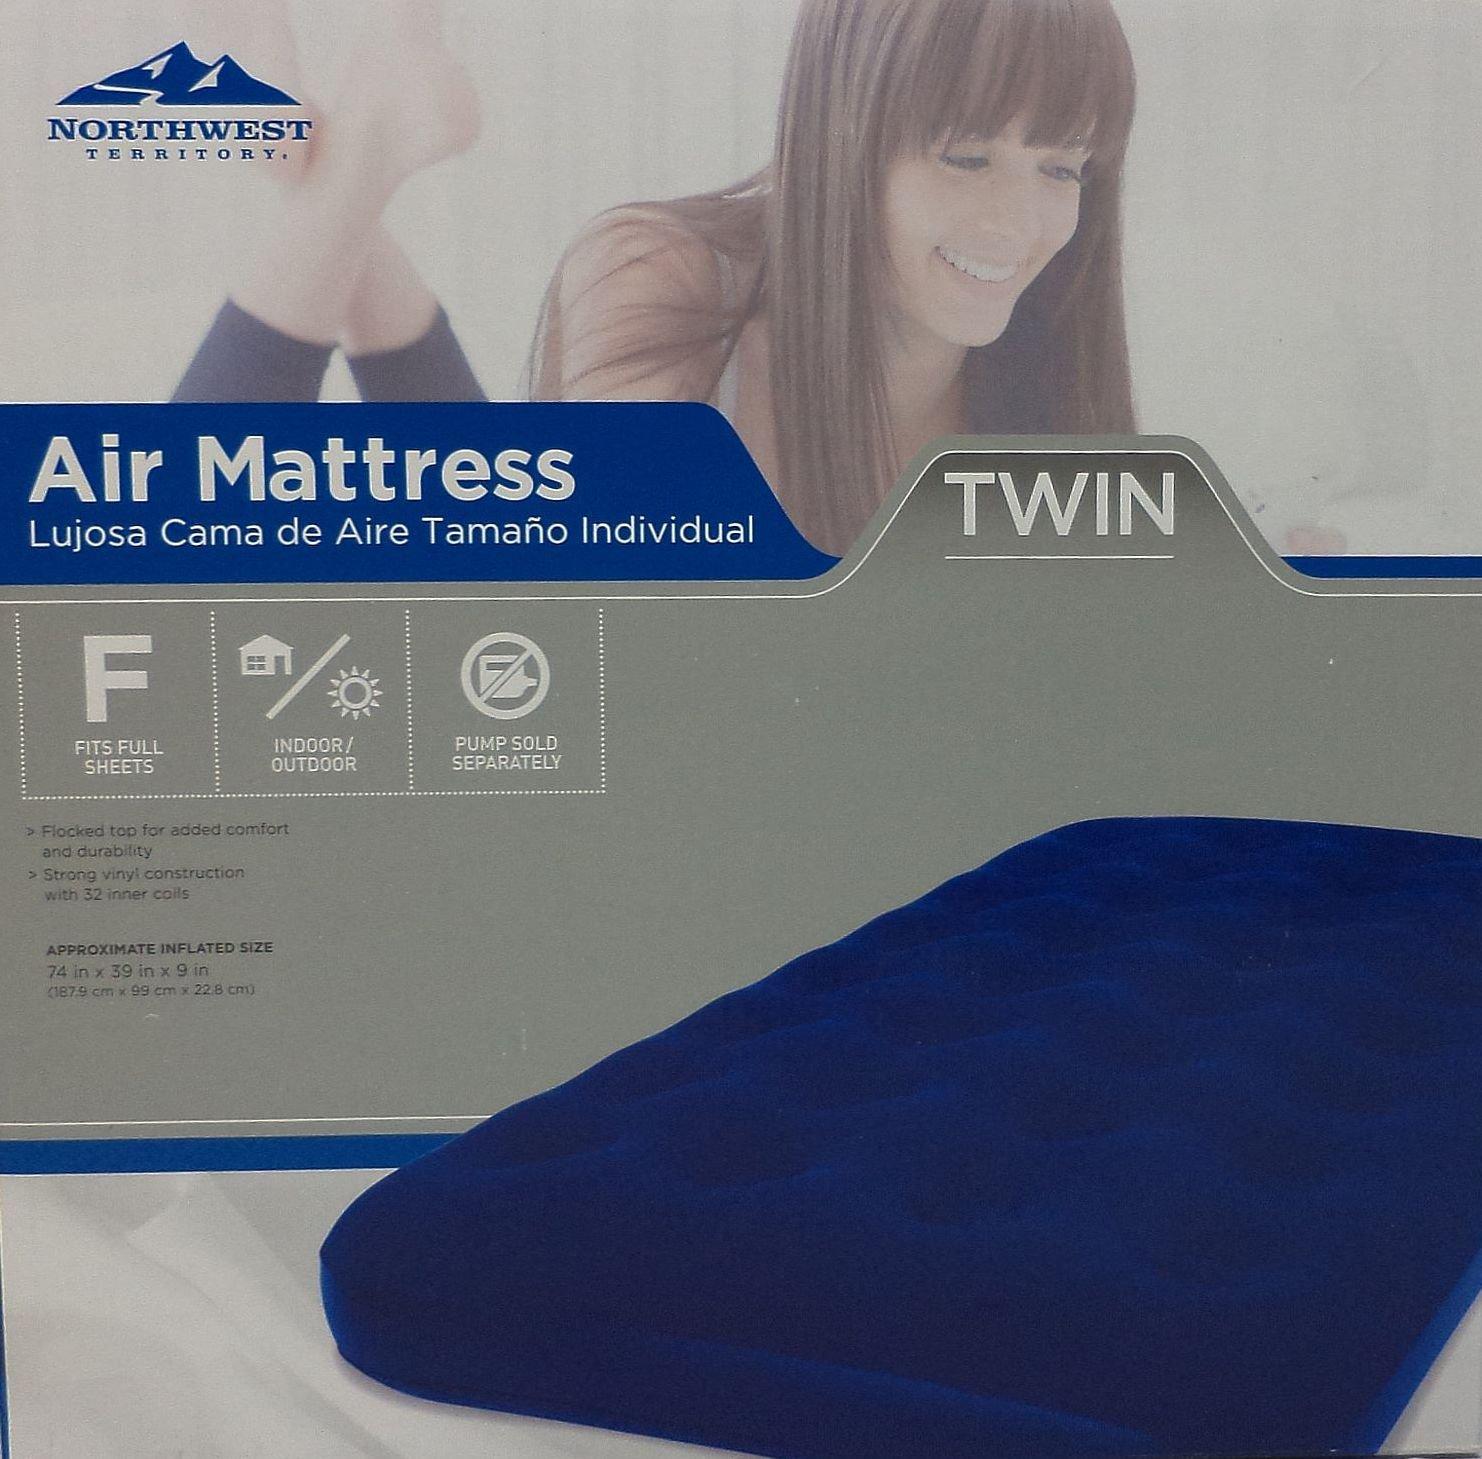 Northwest Territory Air Mattress Twin Sporting Goods